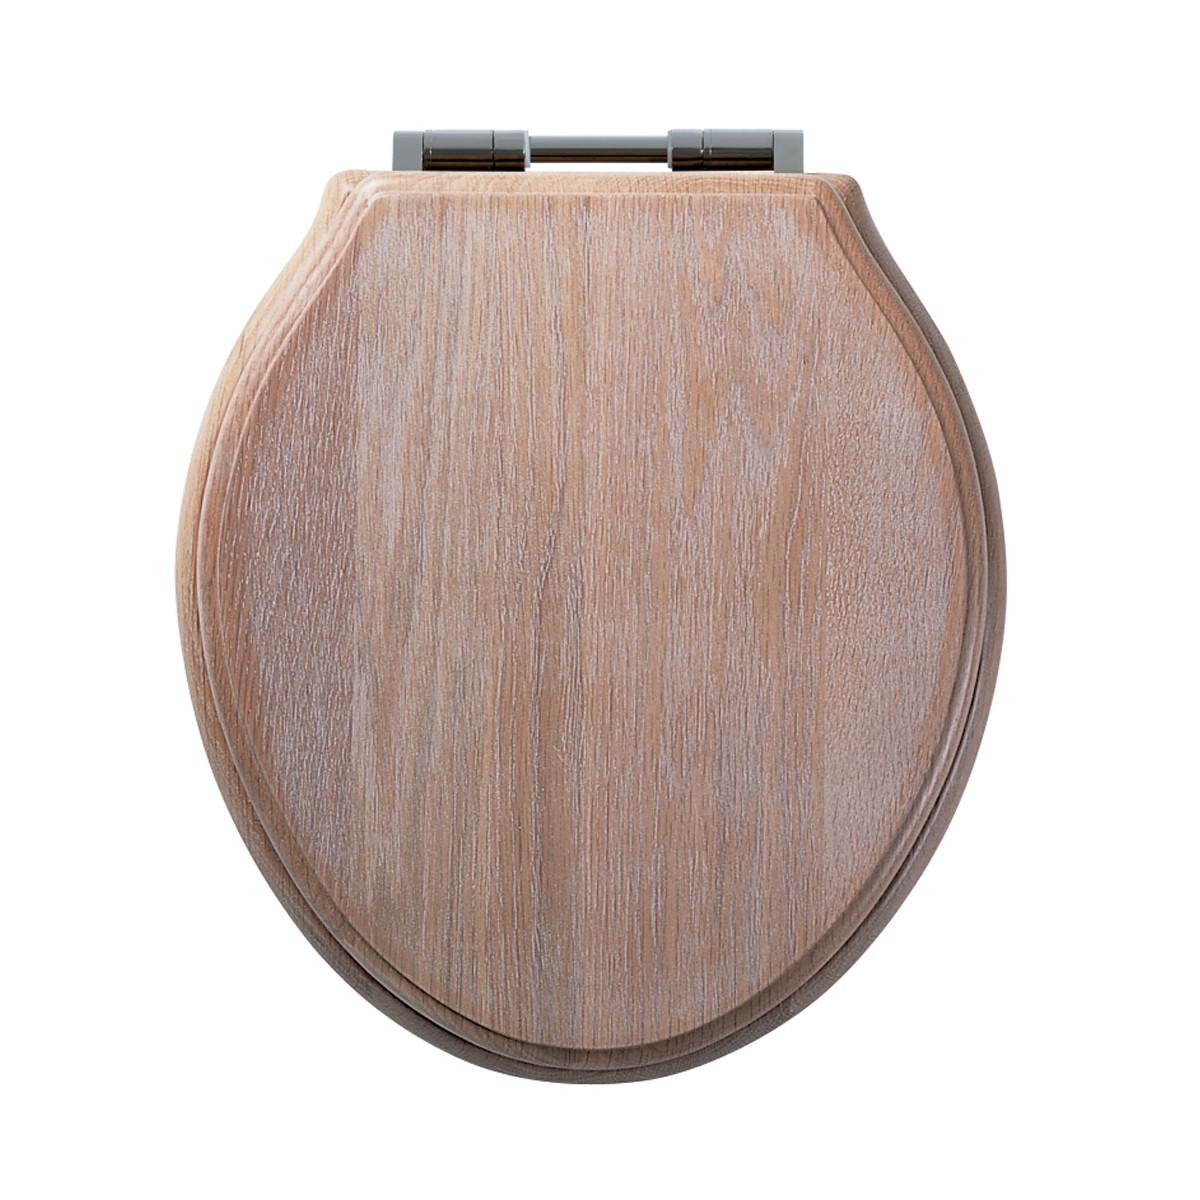 wooden d shaped toilet seat. Wooden D Shaped Toilet Seat Home Design Plan Photo  Soft Close White Images Fruitesborrascom